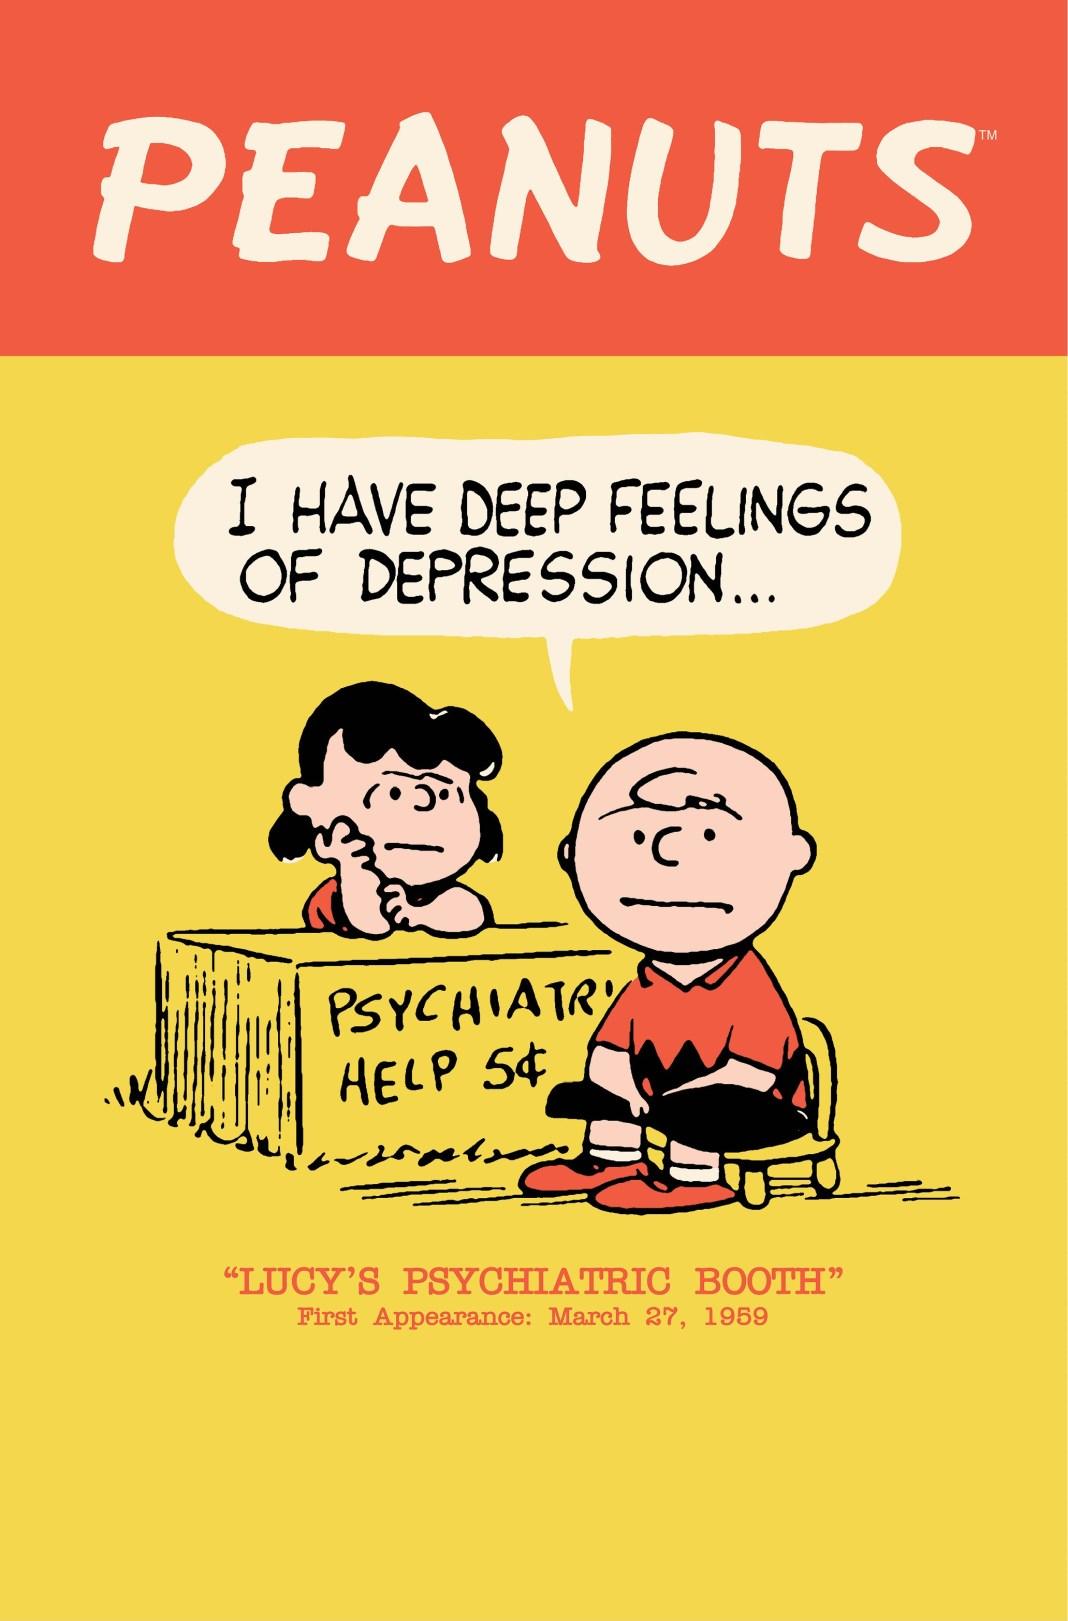 1st Lucy Psychiatric Help Desk in Peanuts